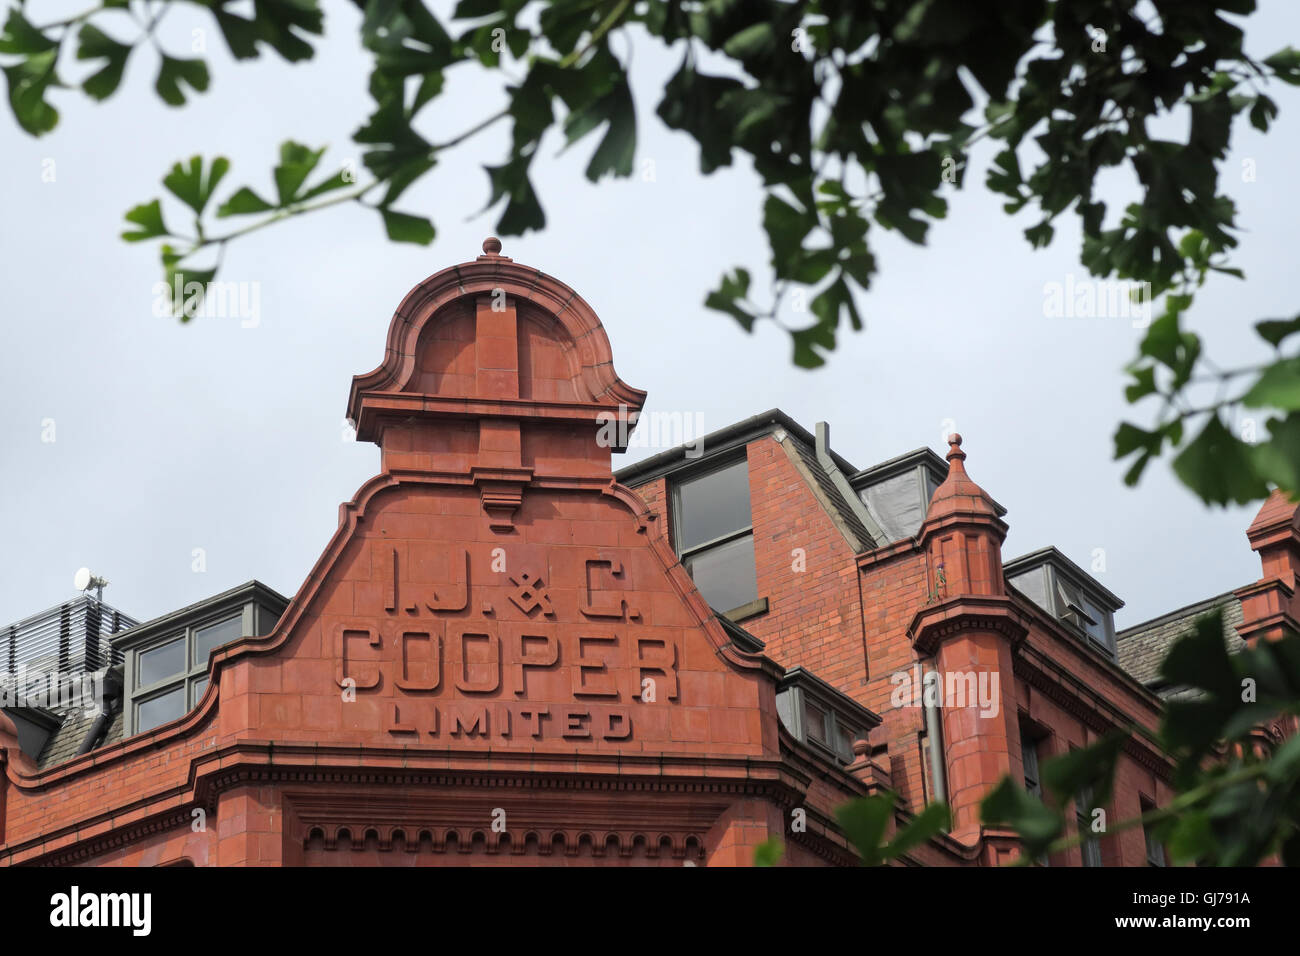 Dieses Stockfoto: IJ&C Cooper Limited Gebäude, Sevendale House, 7 Dale Street, Manchester M1 1JA - GJ791A